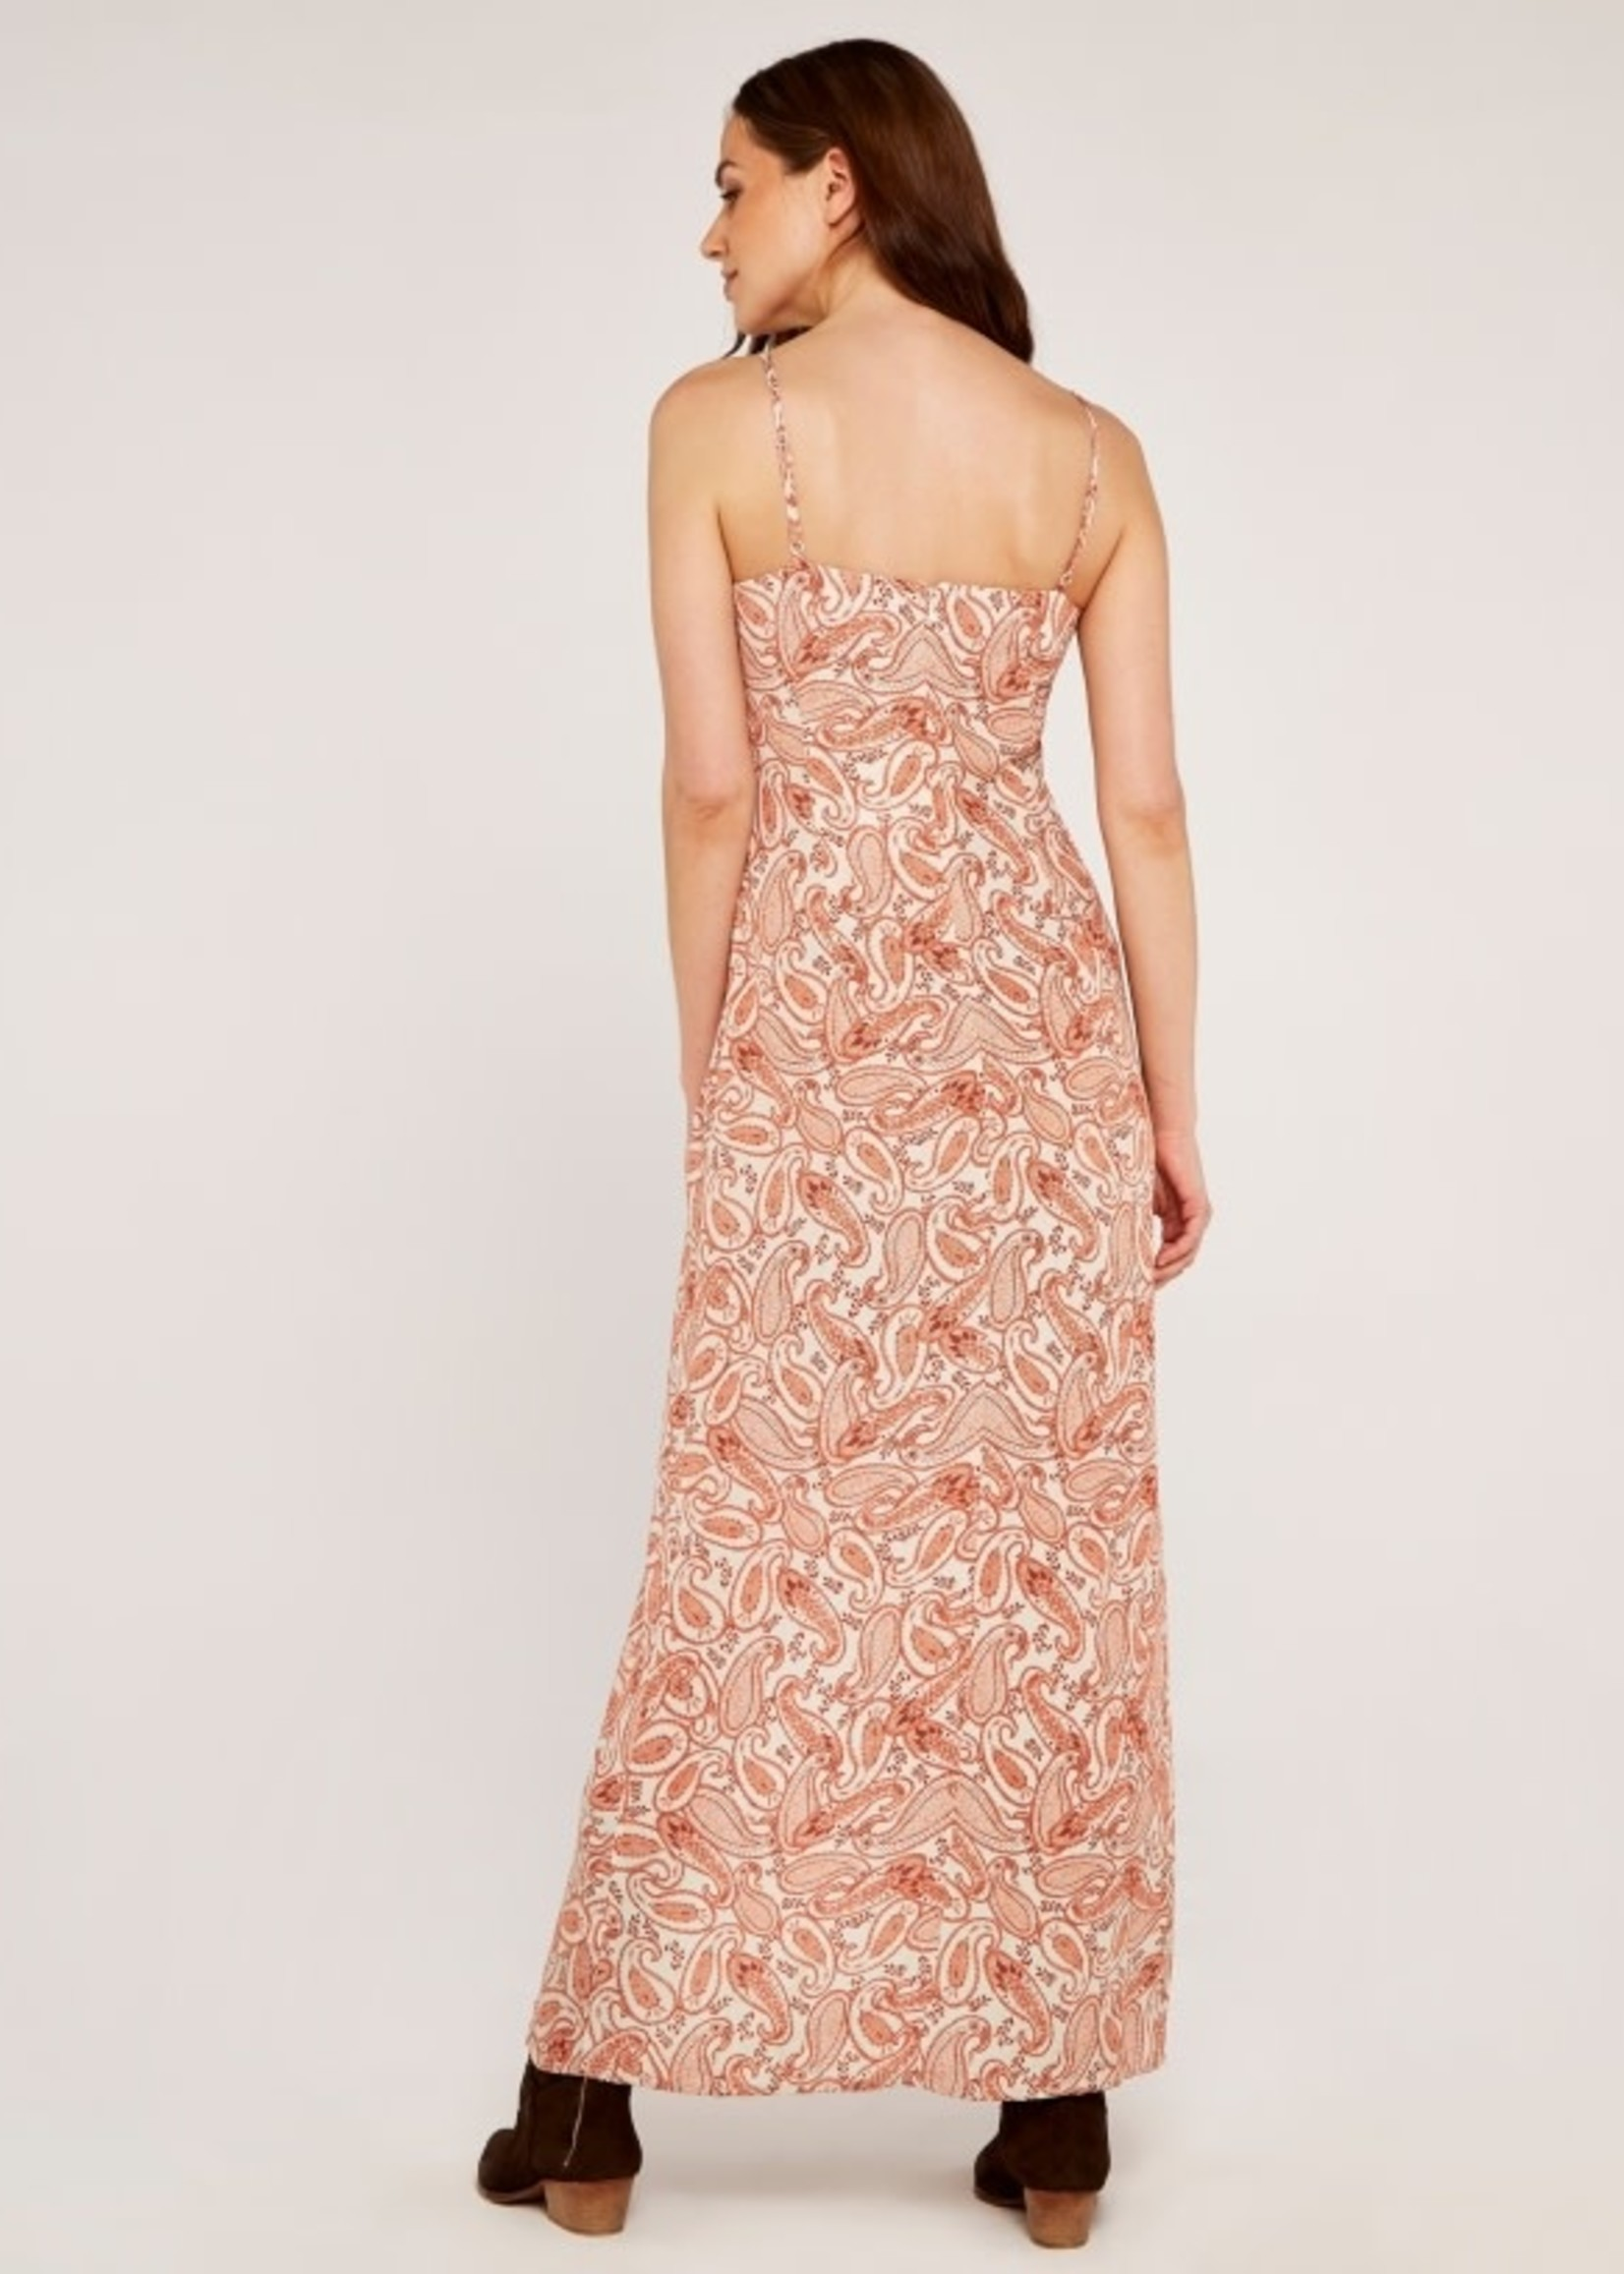 Apricot Paisley Dress